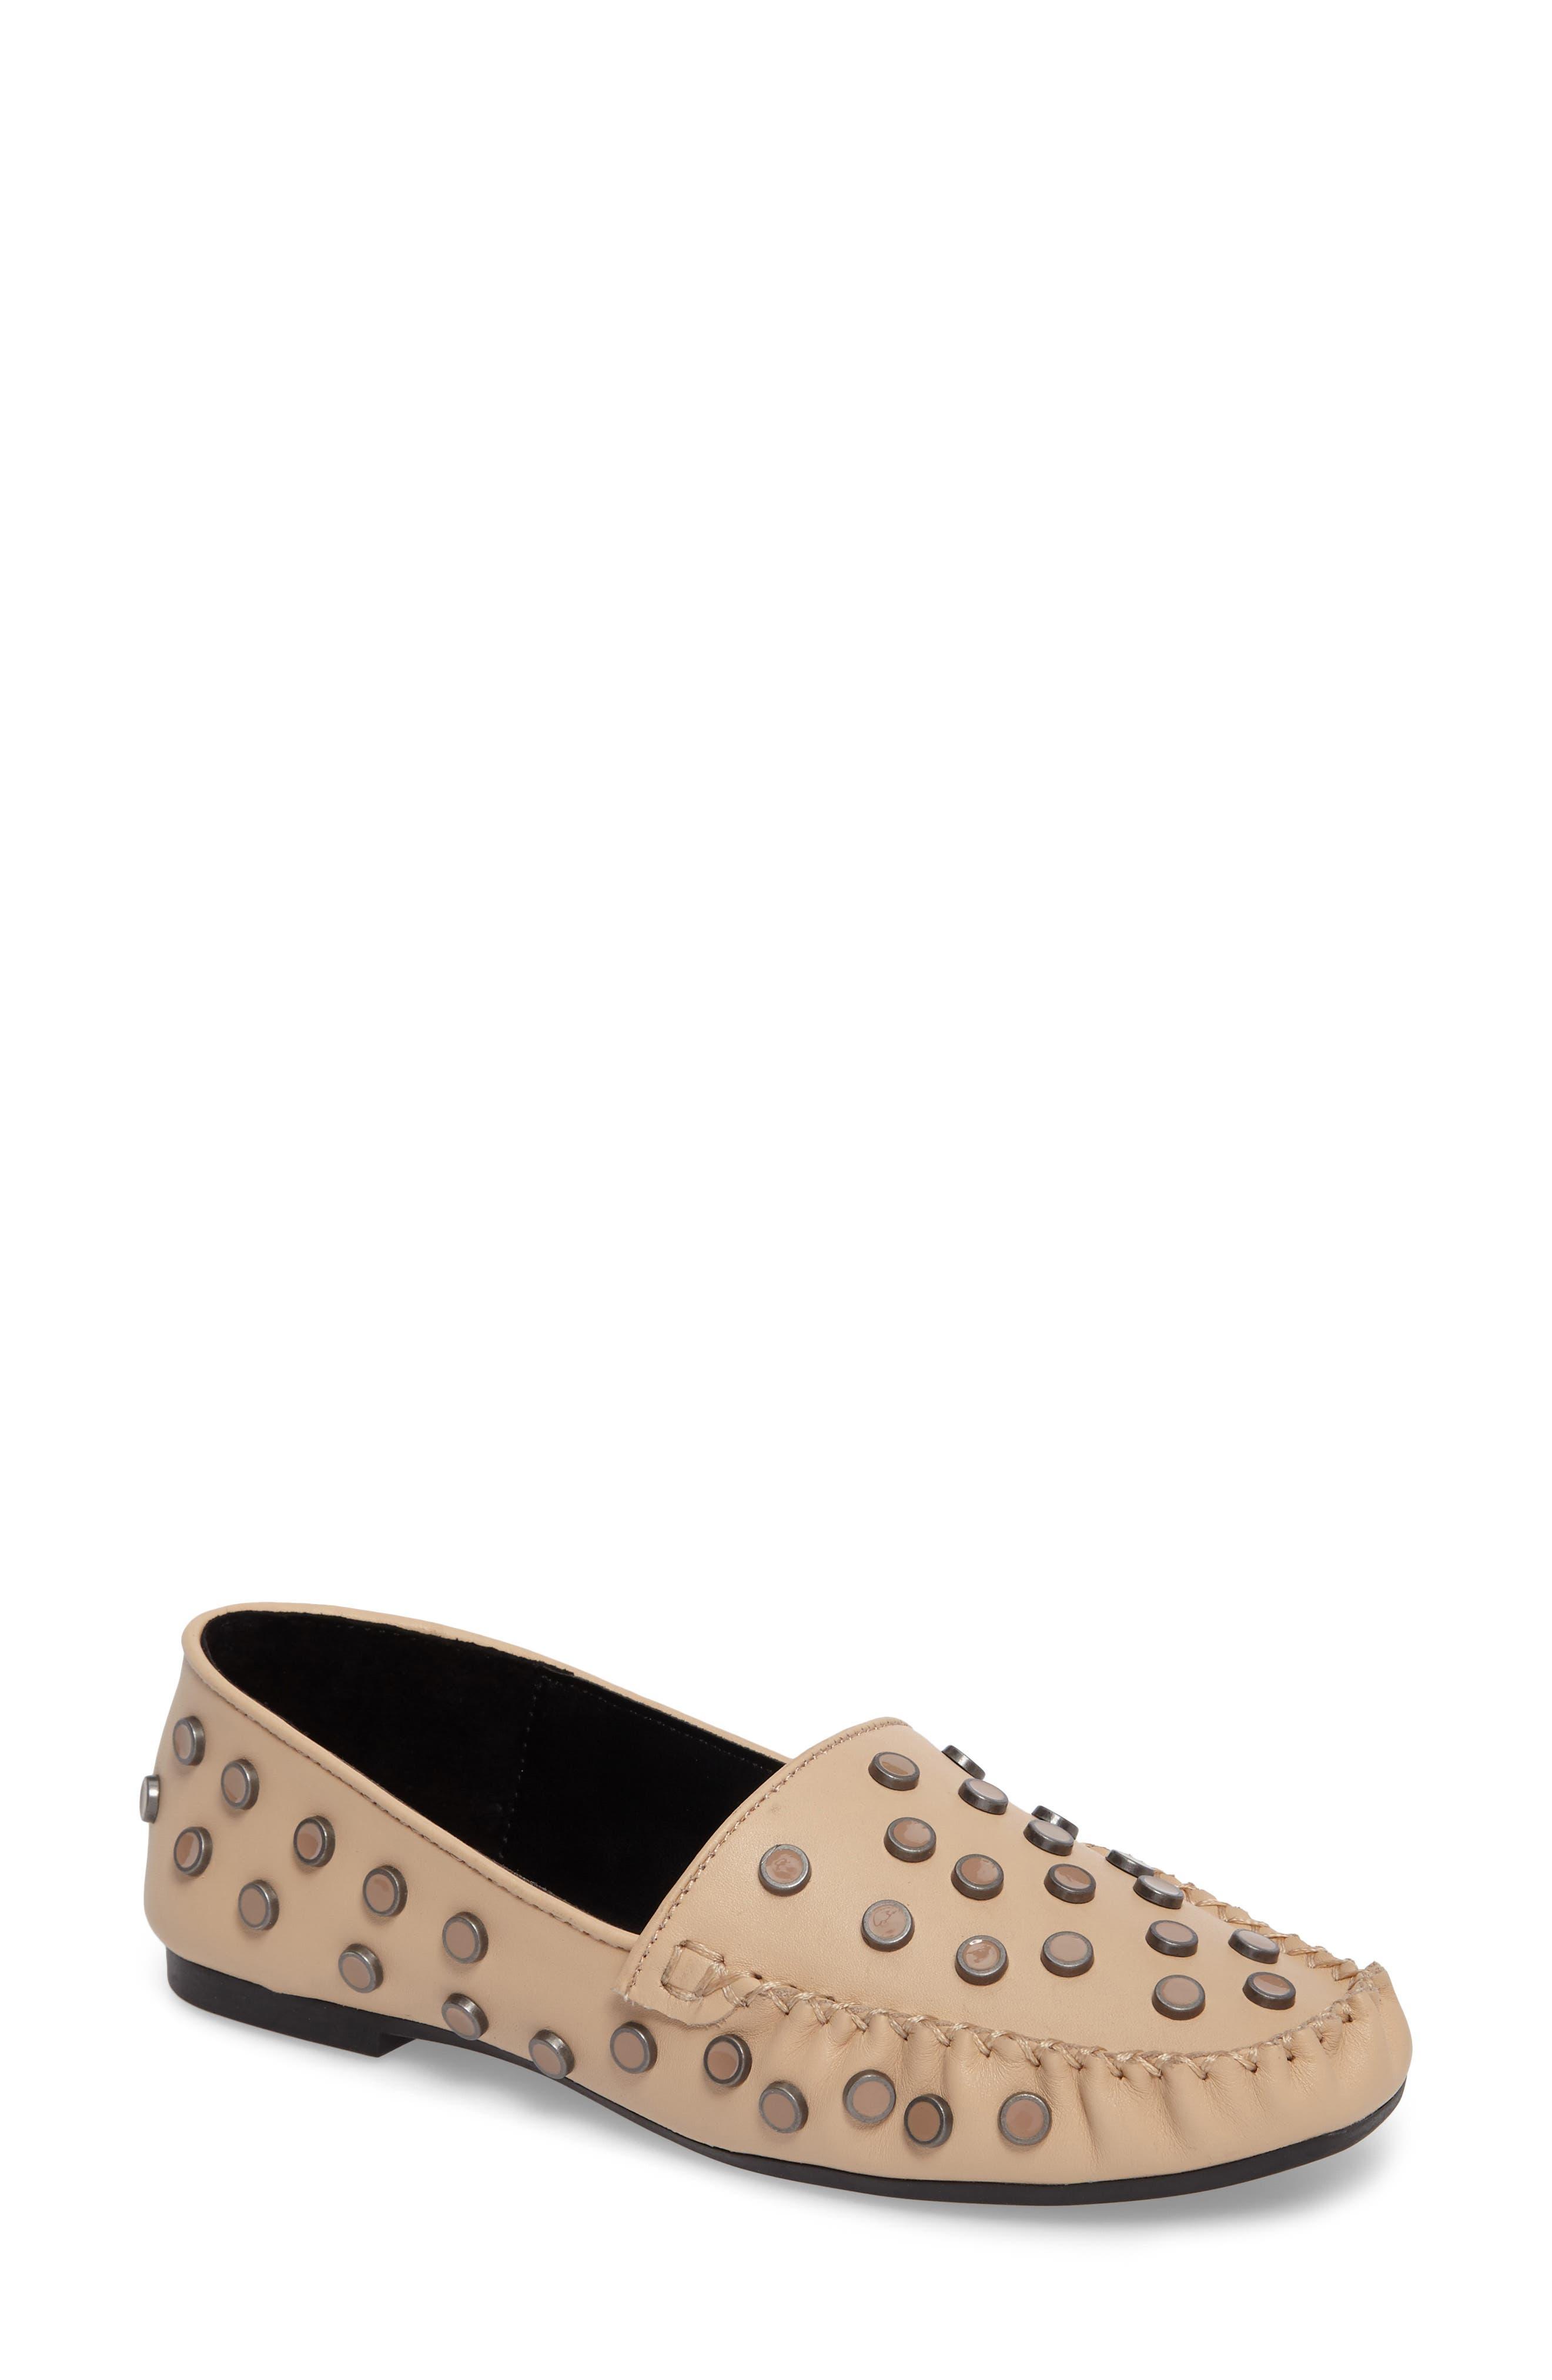 Alternate Image 1 Selected - M4D3 Conneticut Loafer (Women)